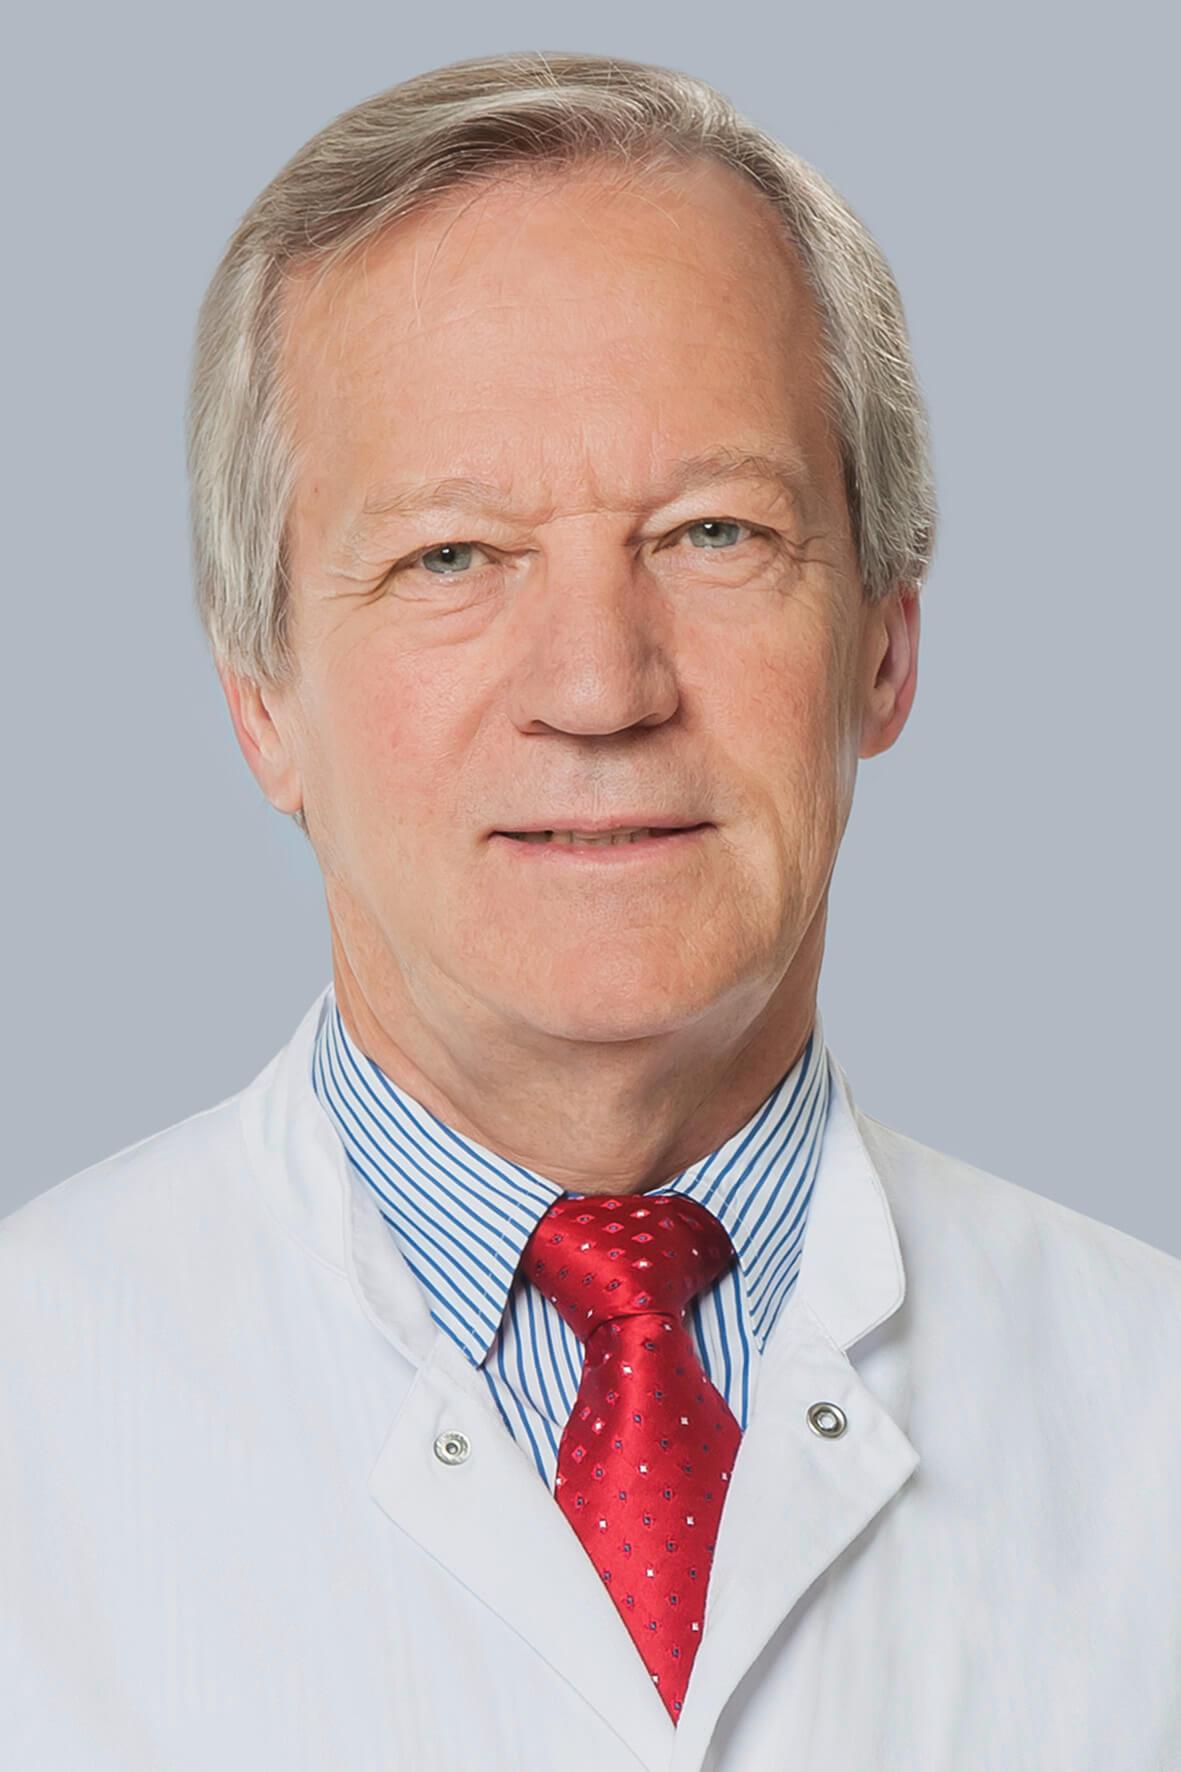 Prof. Dr. med. Armin Steinmetz, F.A.H.A.